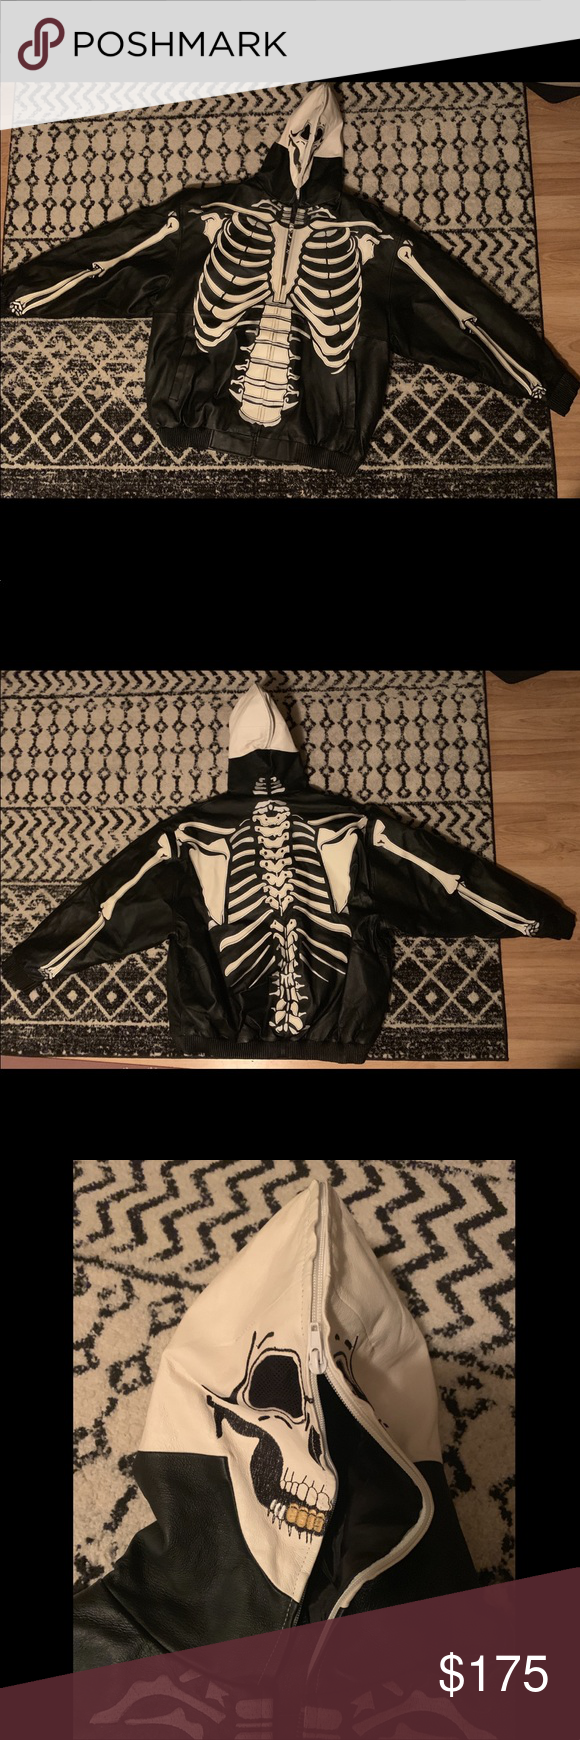 Vilanto Leather Jacket Skull Skeleton Leather Jacket Leather Skeleton Body [ 1740 x 580 Pixel ]